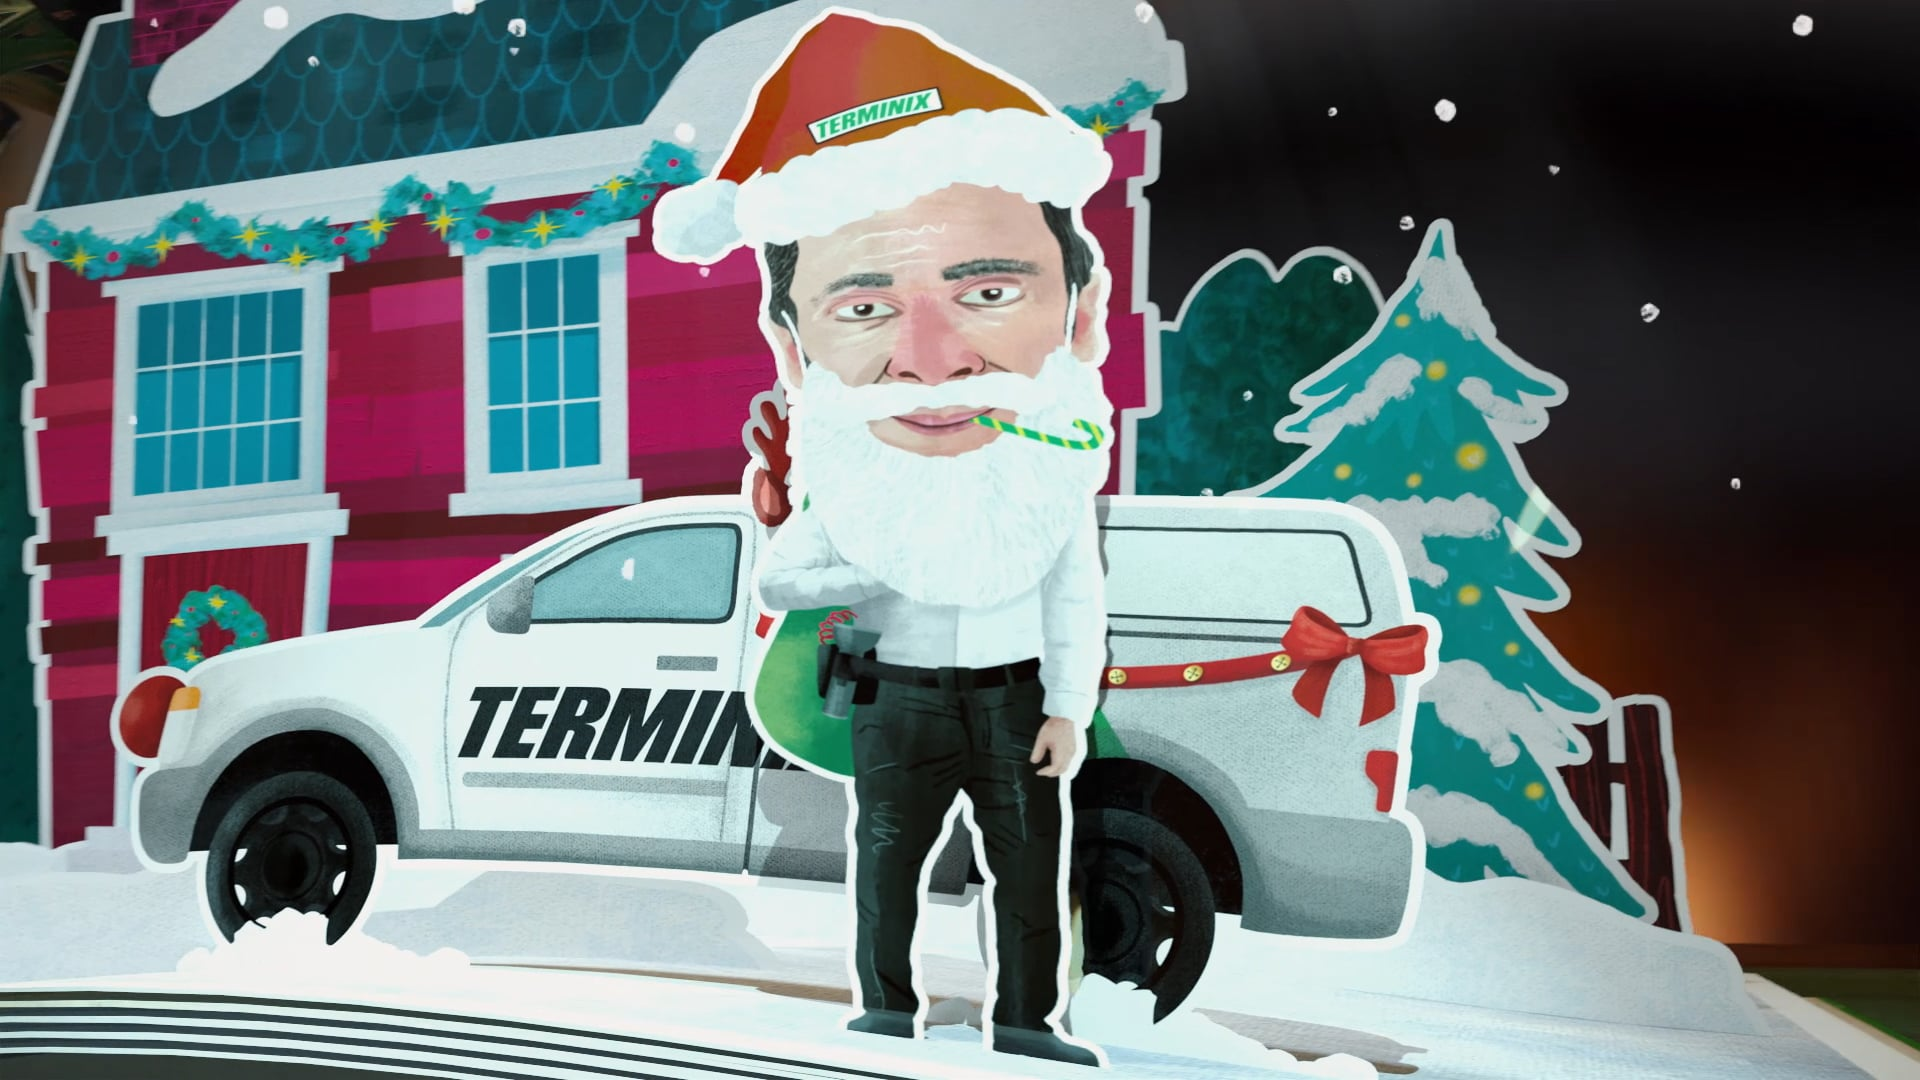 Terminix Holidays!